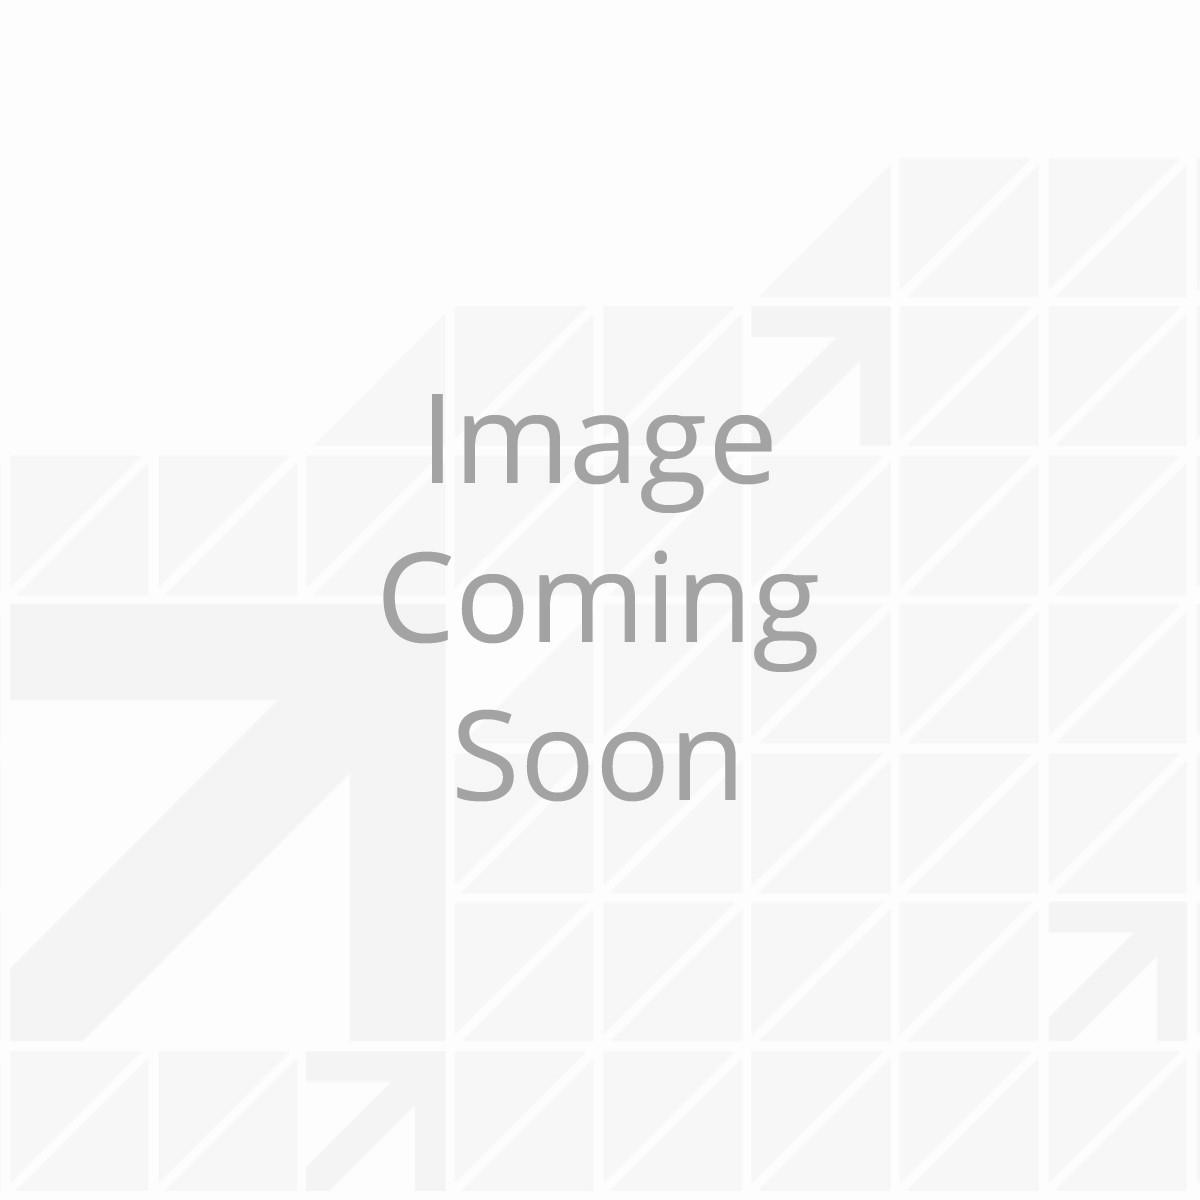 Solera® Regal Idler Head Front Cover - Various Colors